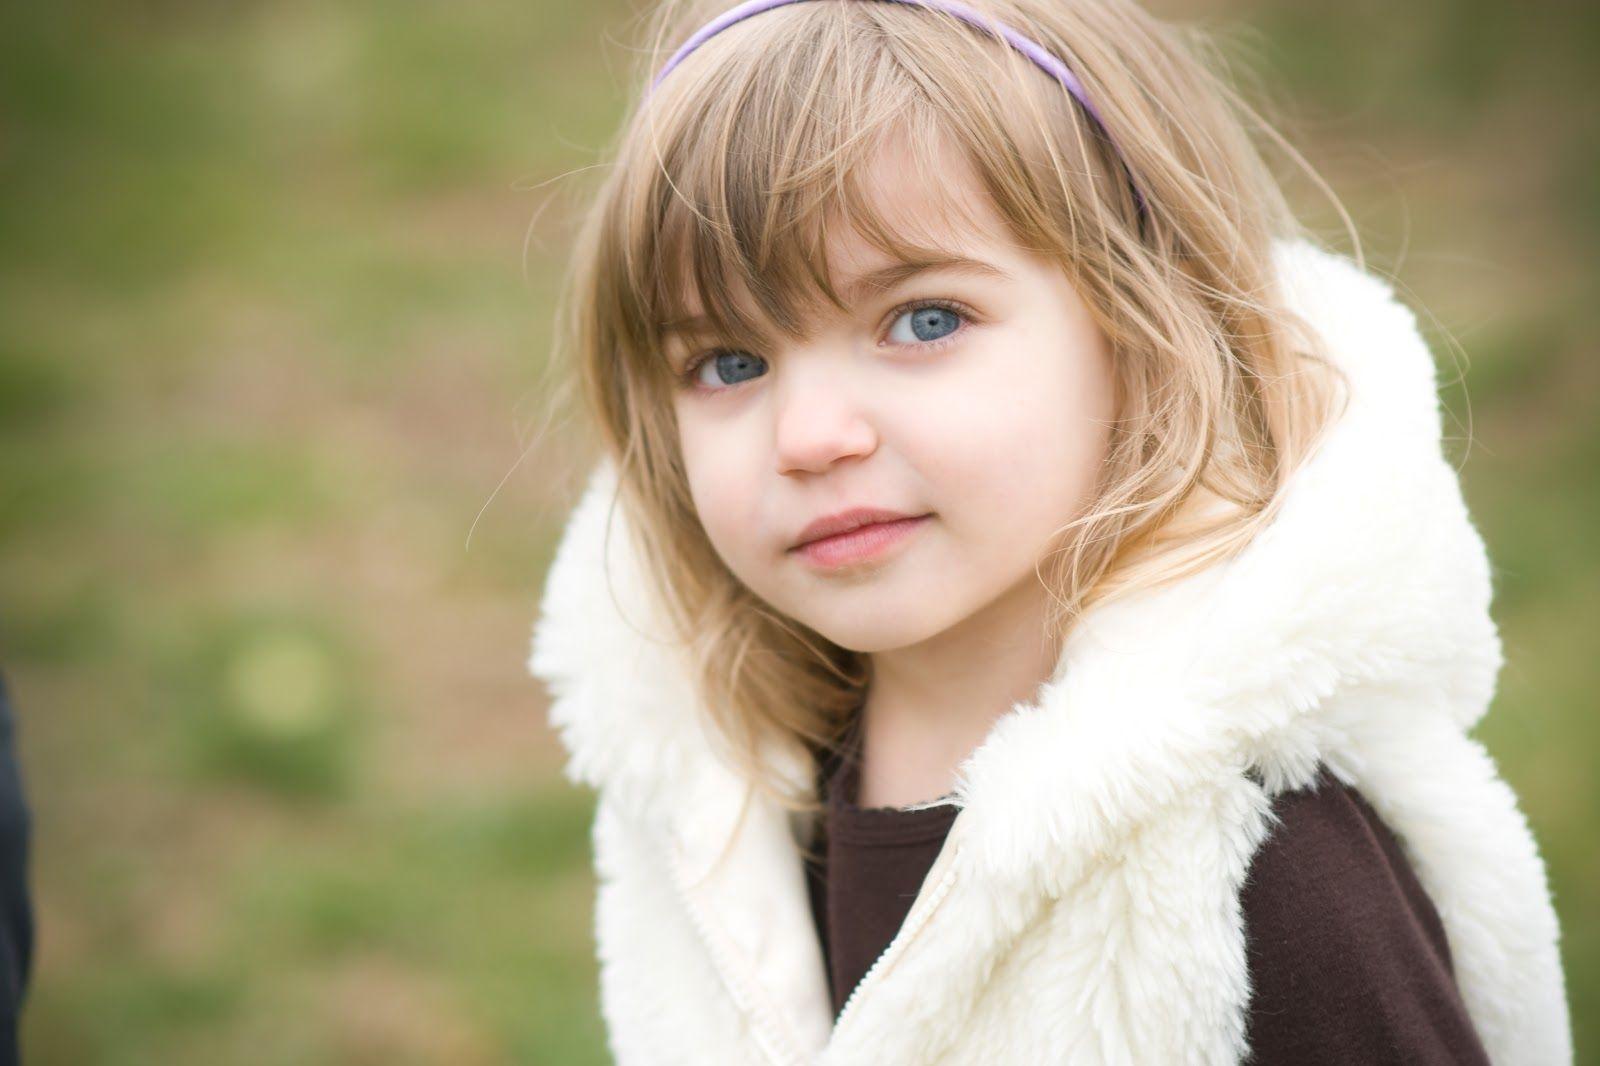 Wallpaper download baby girl - Beautiful Baby Girls Hd Wallpapers Top Background Baby